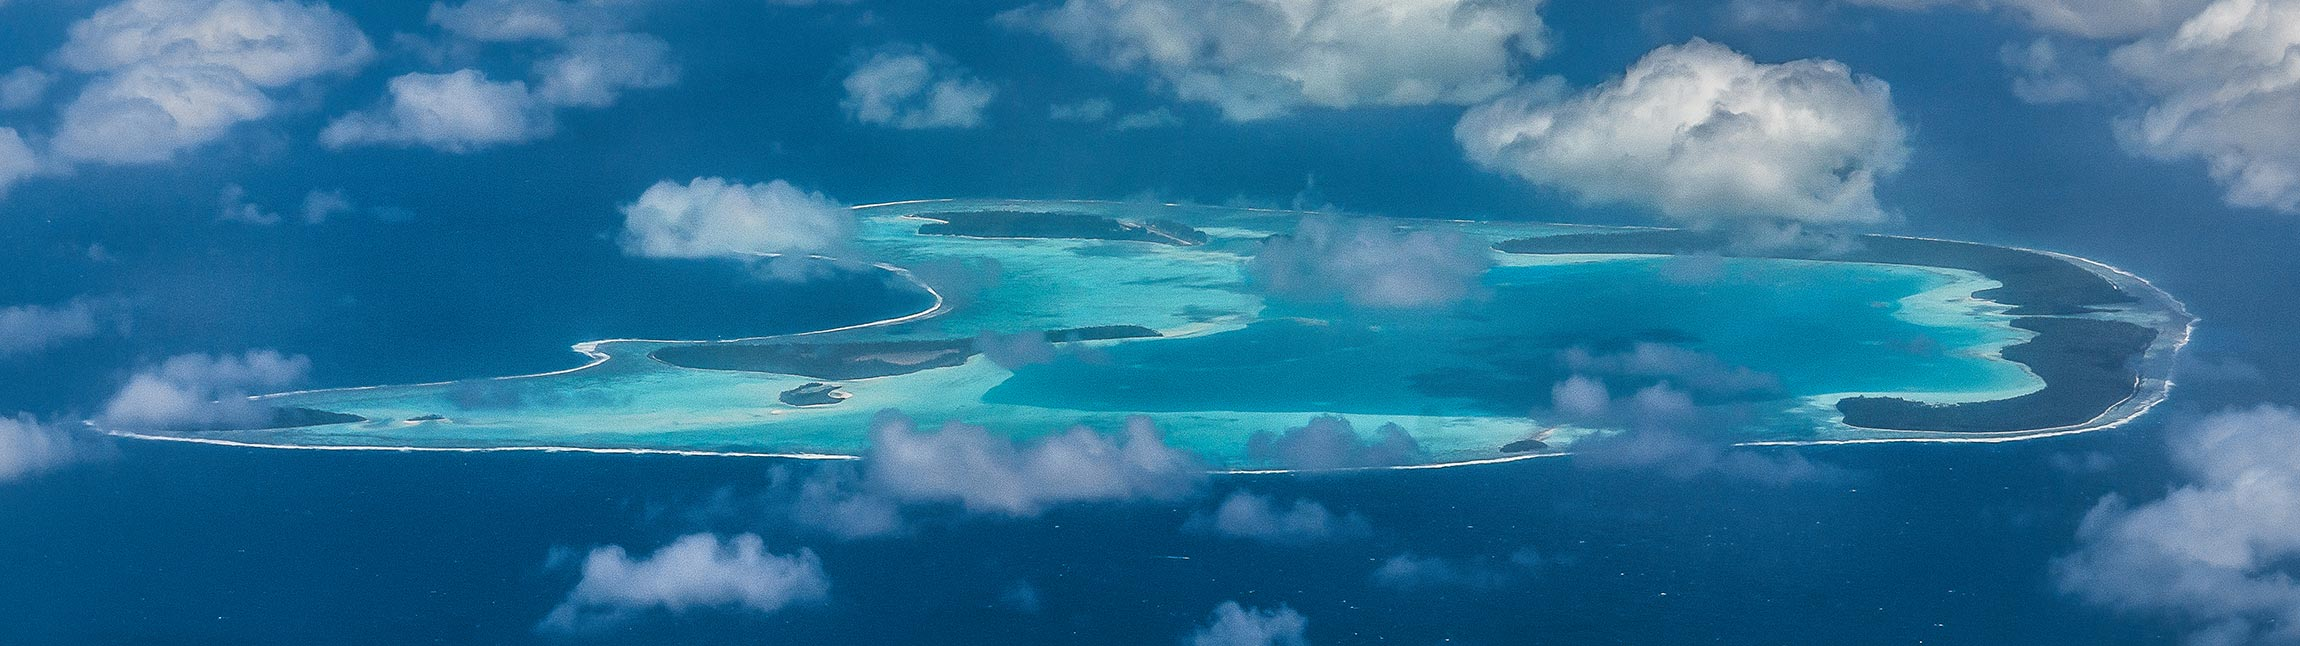 L'atoll de Tikehau vue d'avion - Topdive